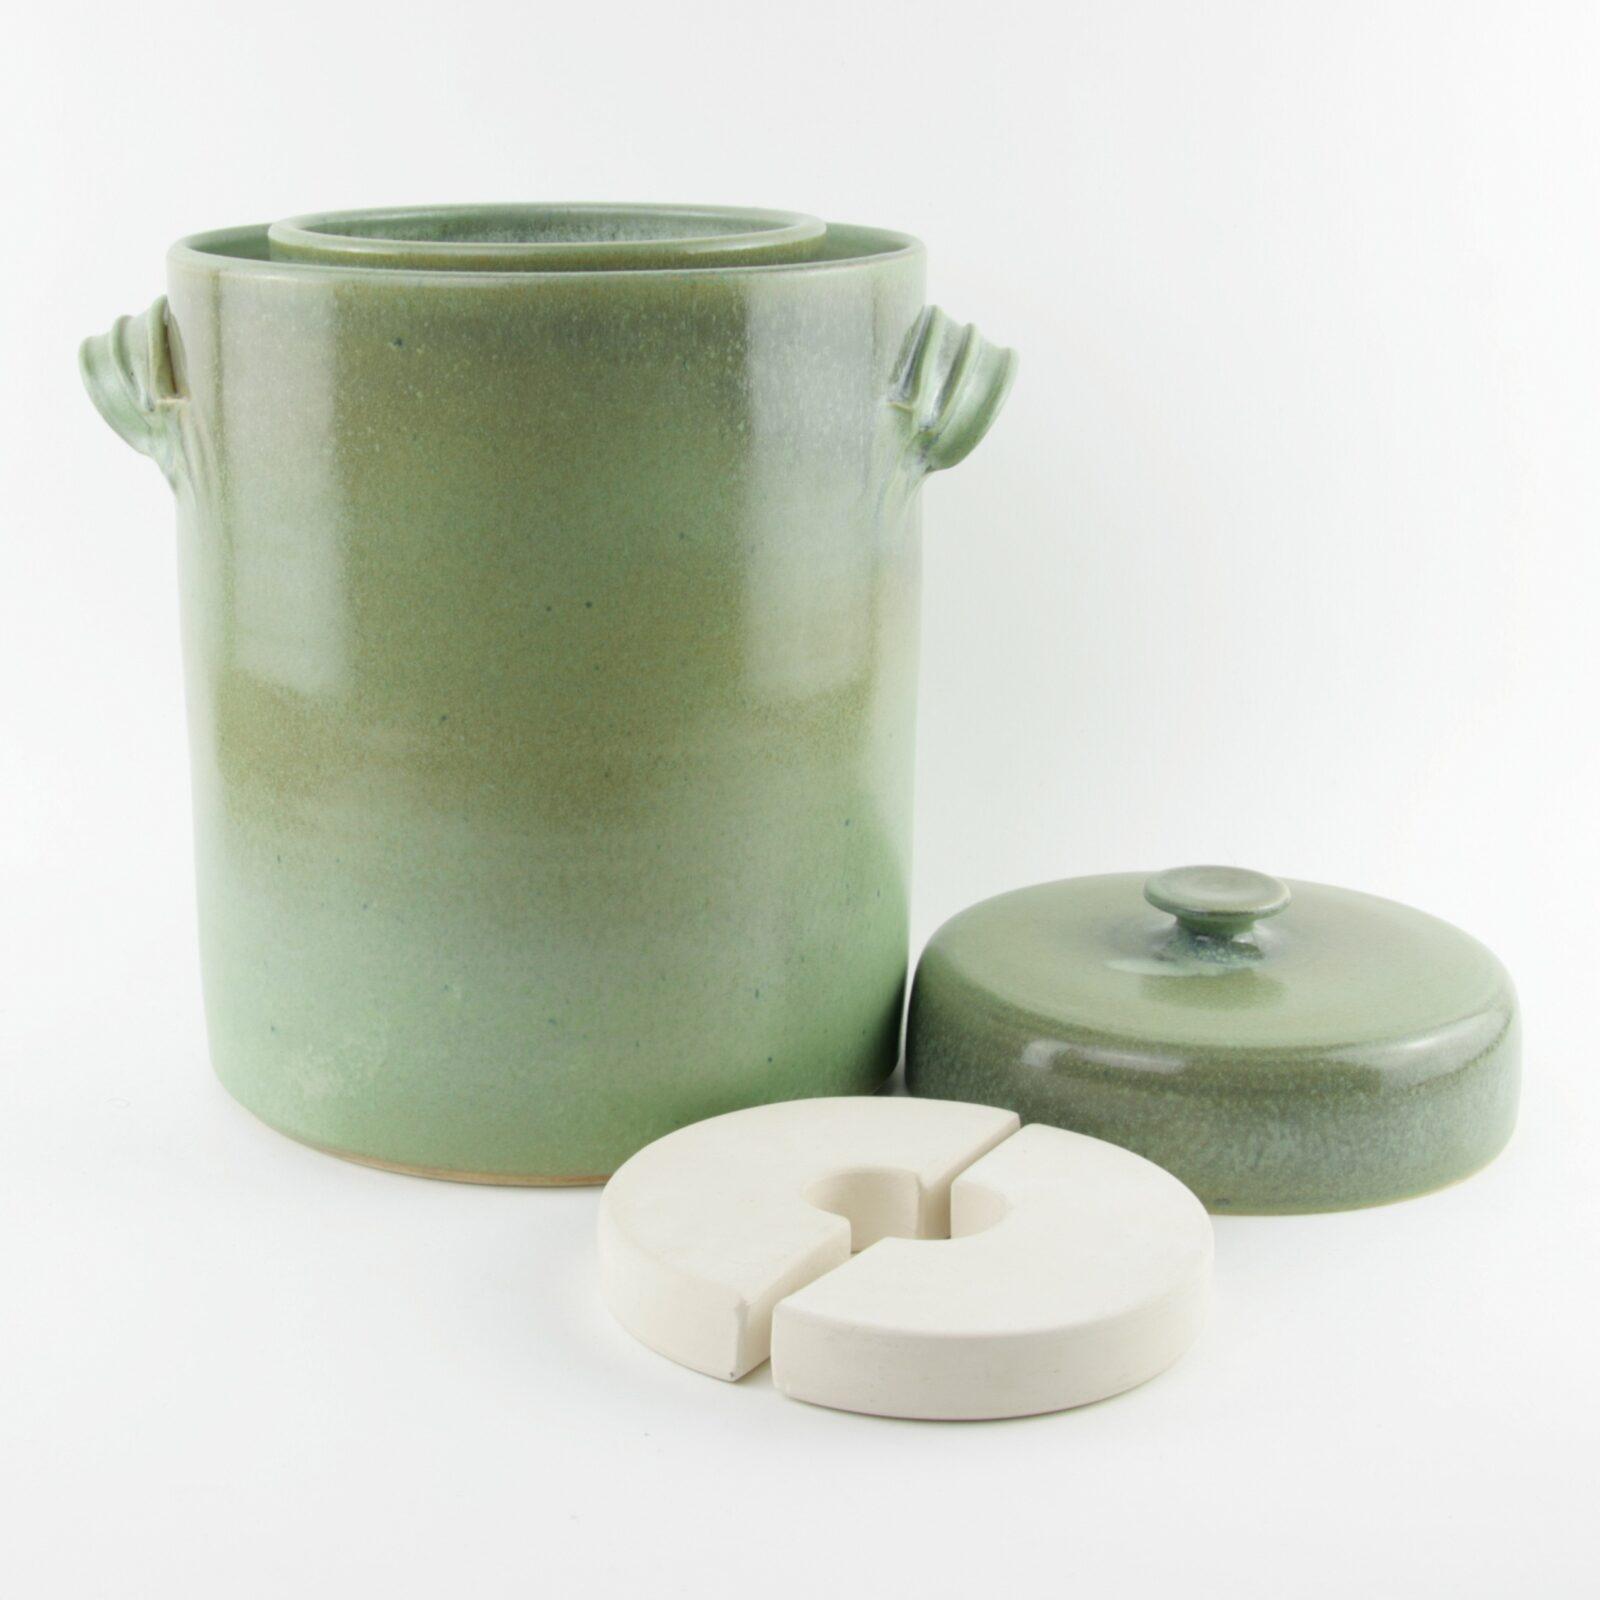 4 litre handmade ceramic sauerkraut crock in green with weight stones